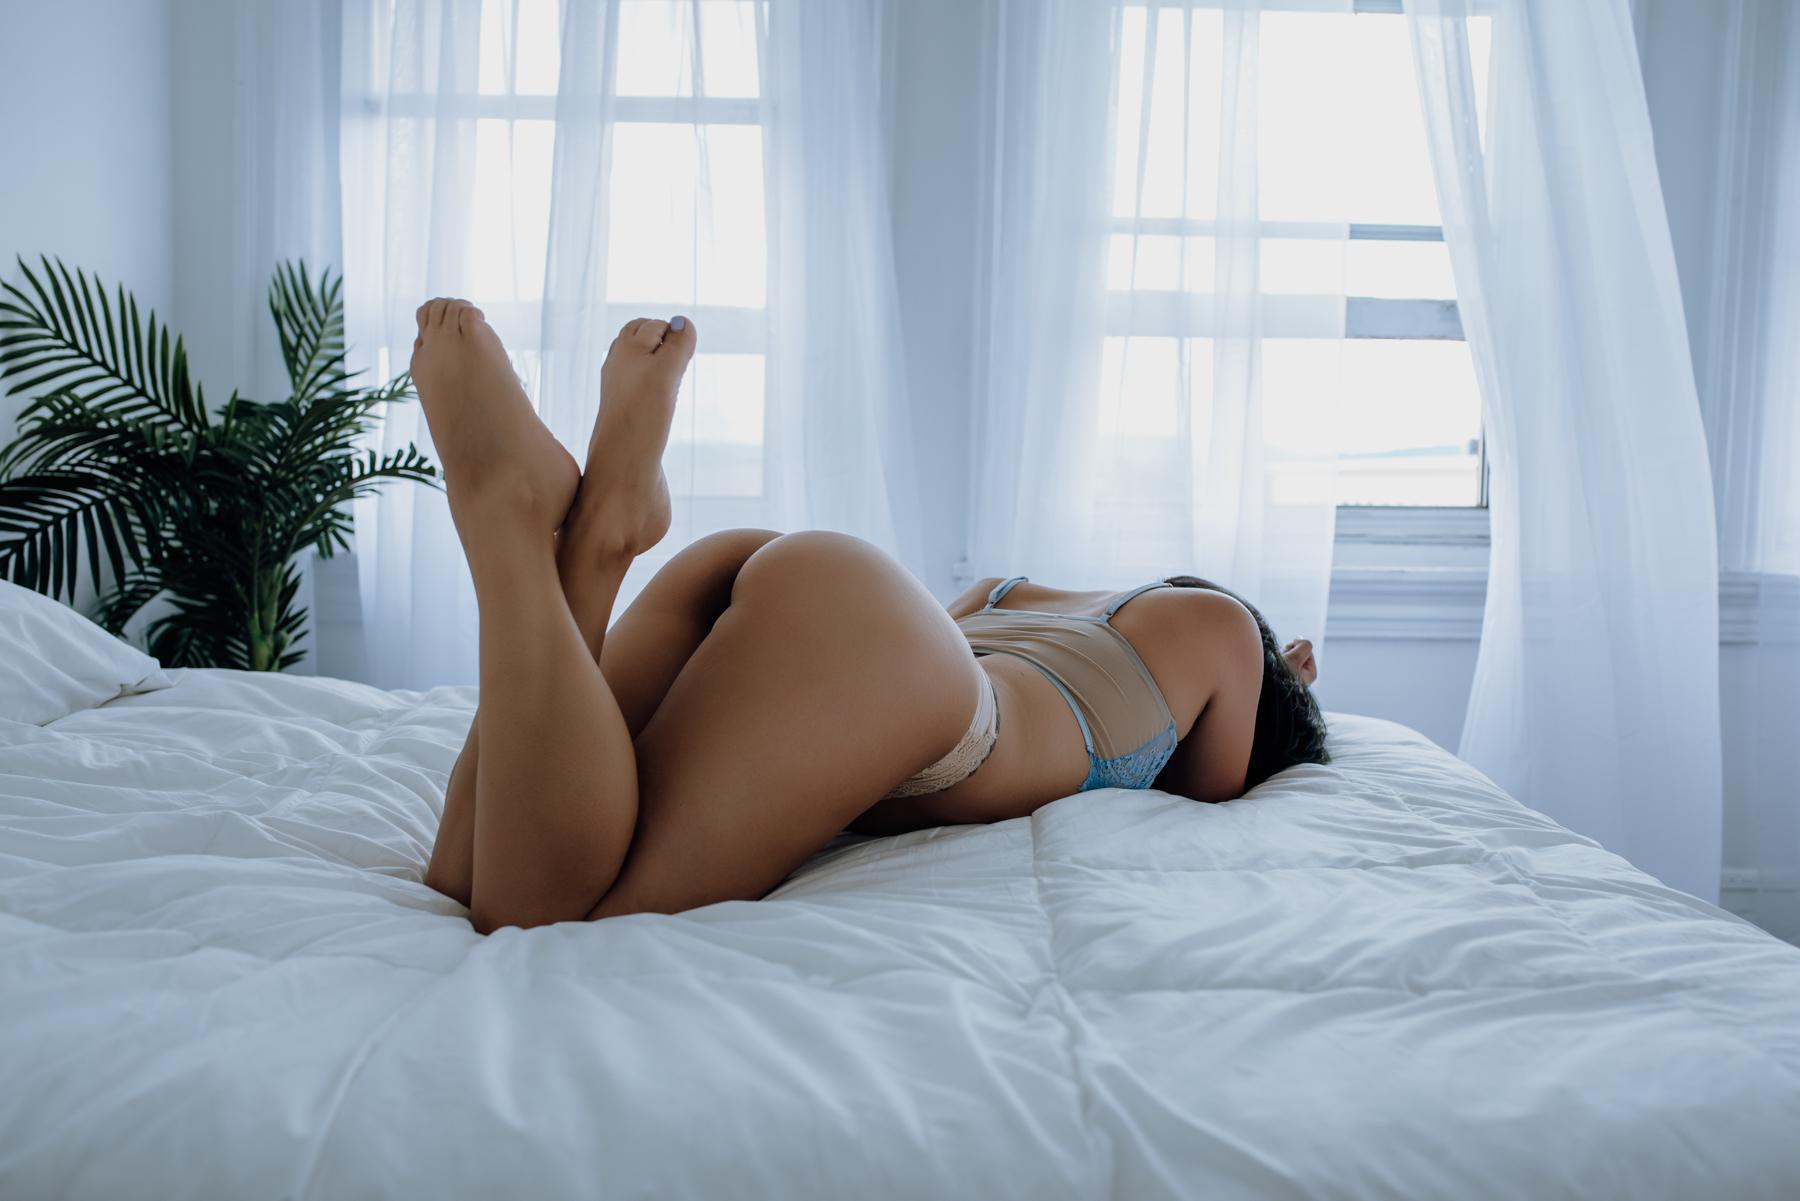 berks county best boudoir photography-9.jpg